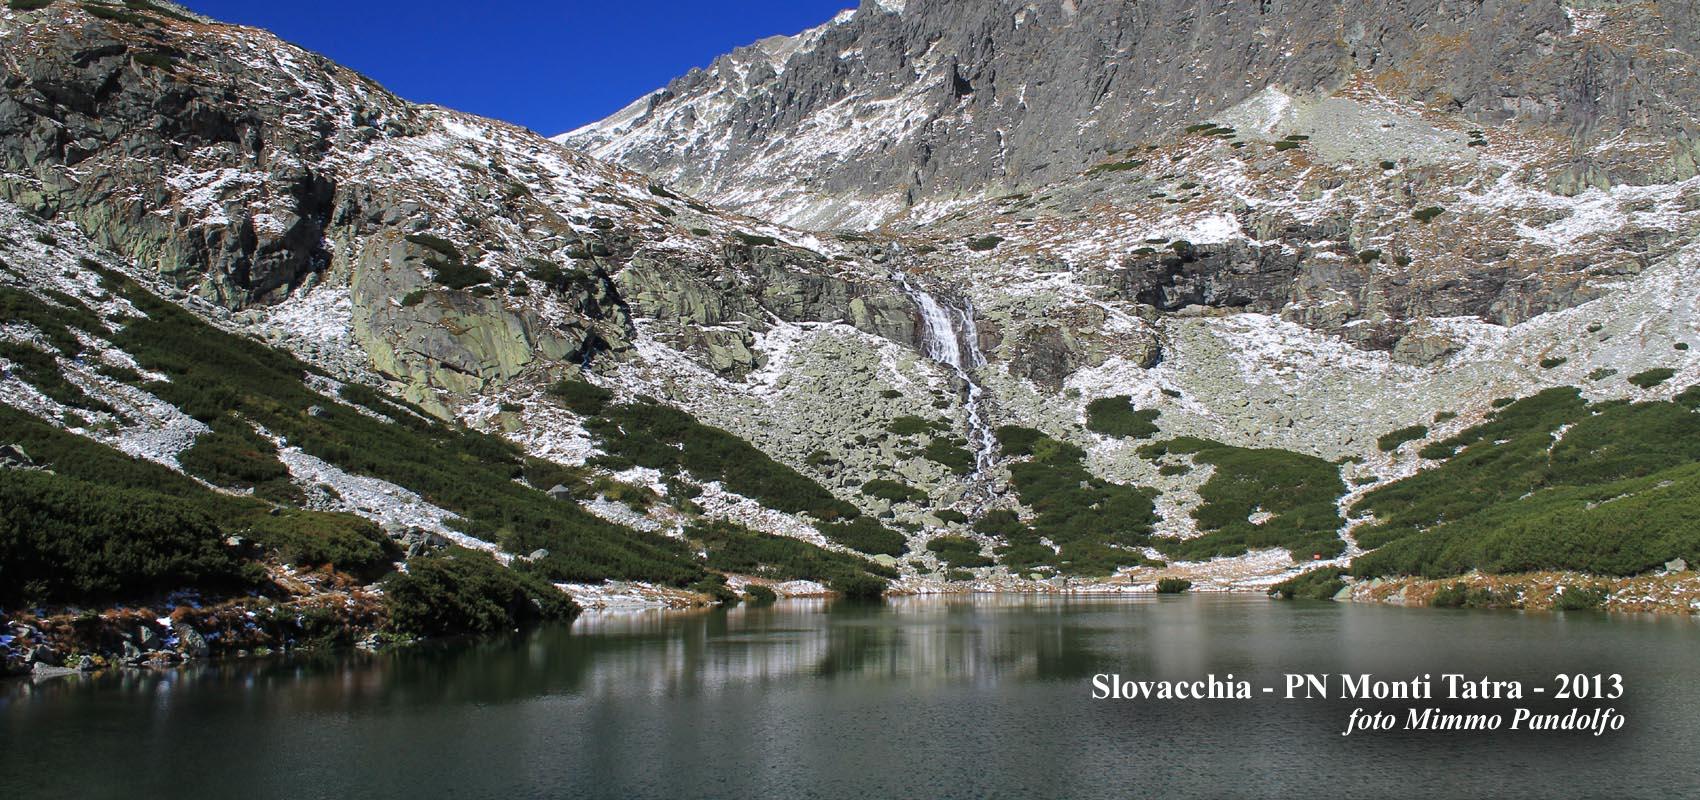 Slovakia, PN Monti Tatra - Velické Pleso - 2013